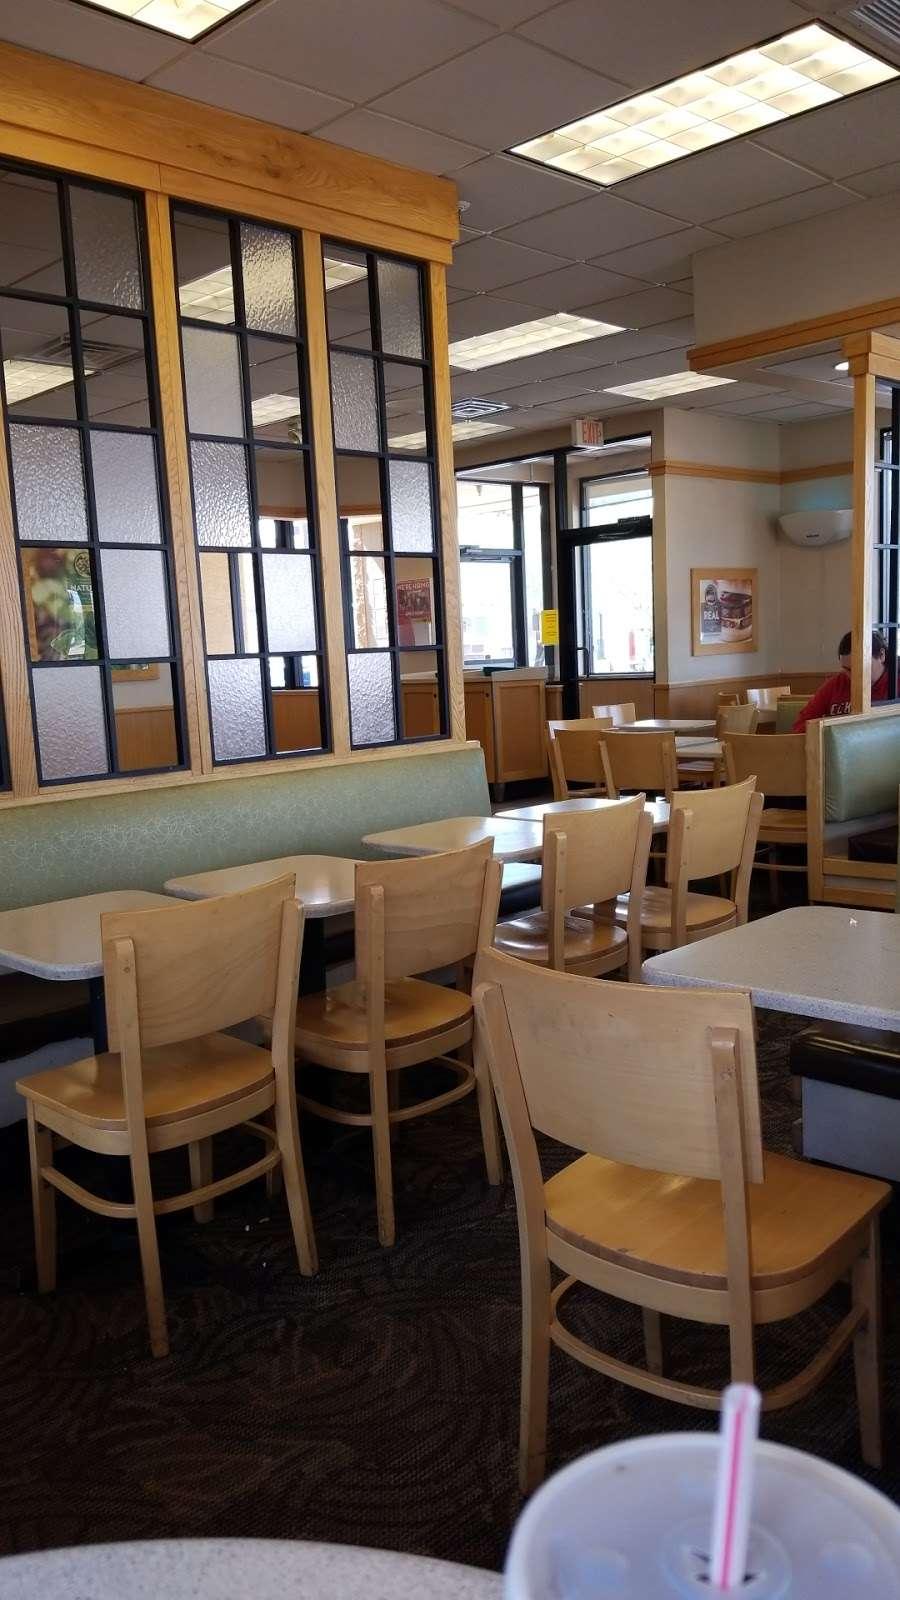 Wendys - restaurant  | Photo 9 of 10 | Address: 1405 W Baseline Rd, Tempe, AZ 85283, USA | Phone: (480) 756-0582